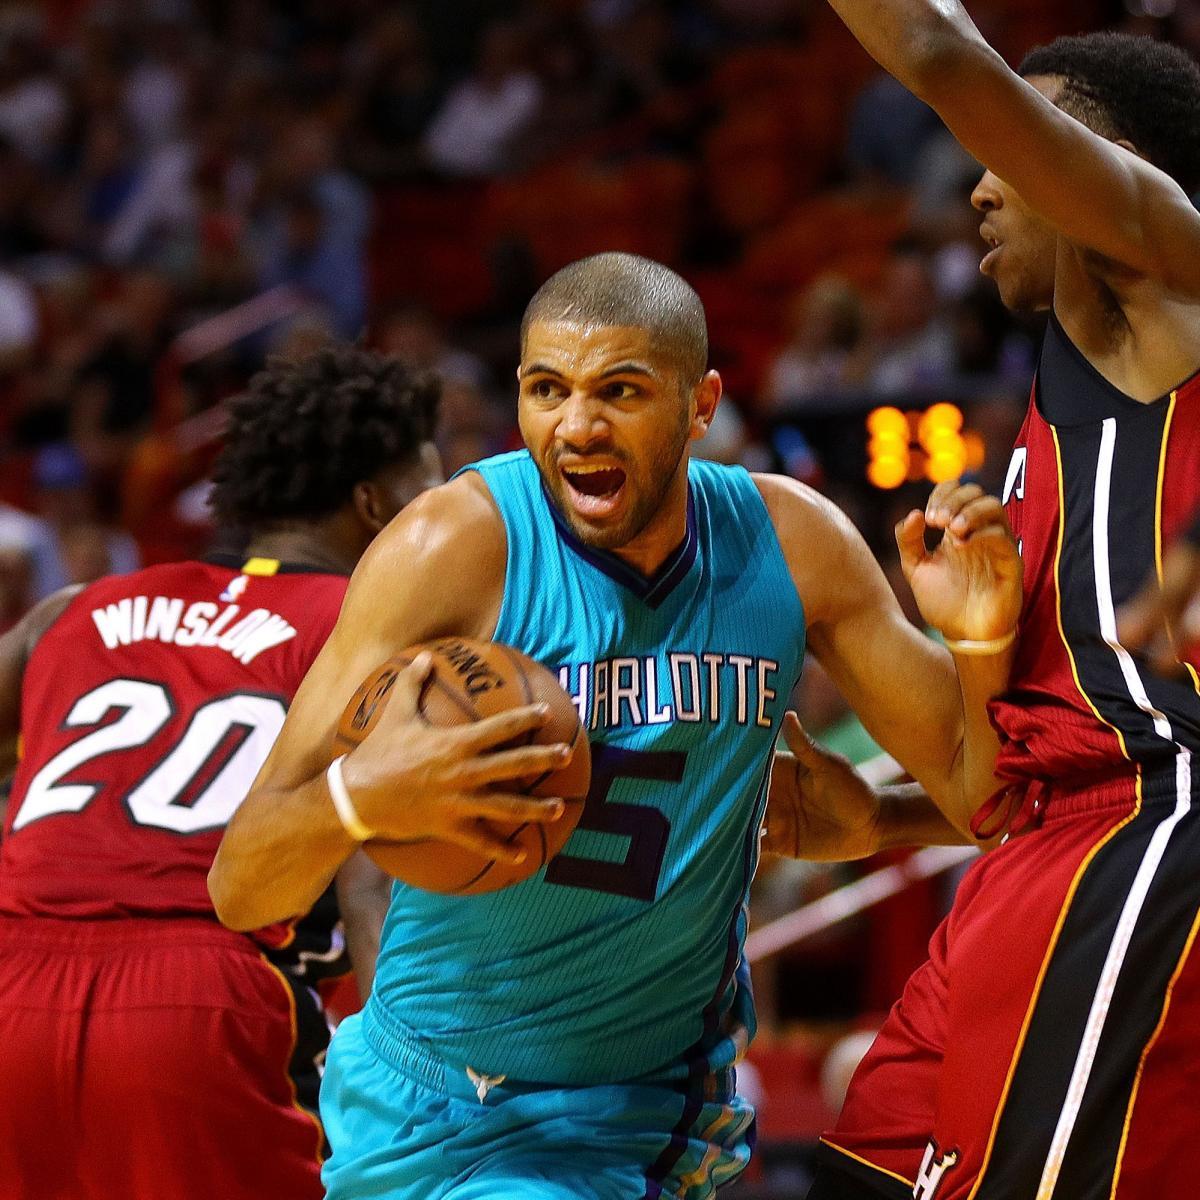 Warriors Vs Heat Live Stream Reddit: Charlotte Hornets Vs. Miami Heat: Live Score, Analysis For